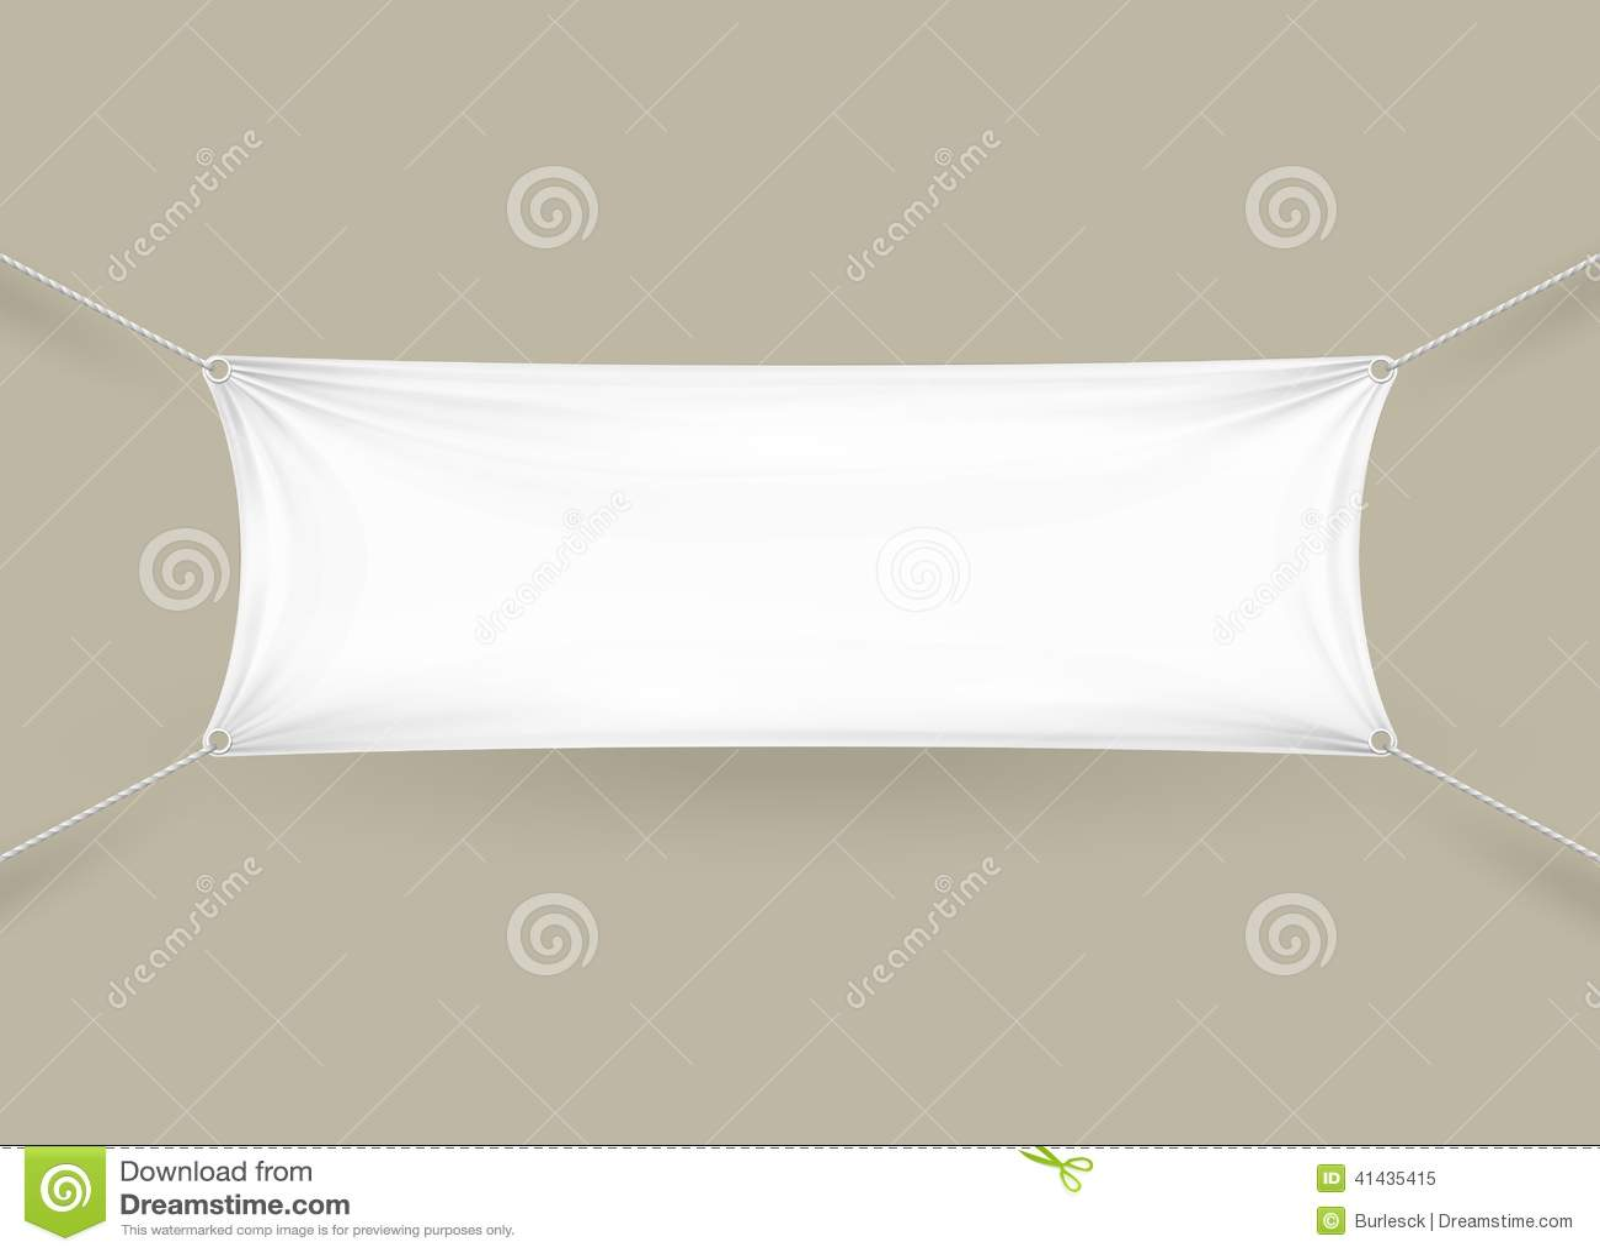 Blank Vinyl Banners | White Gold